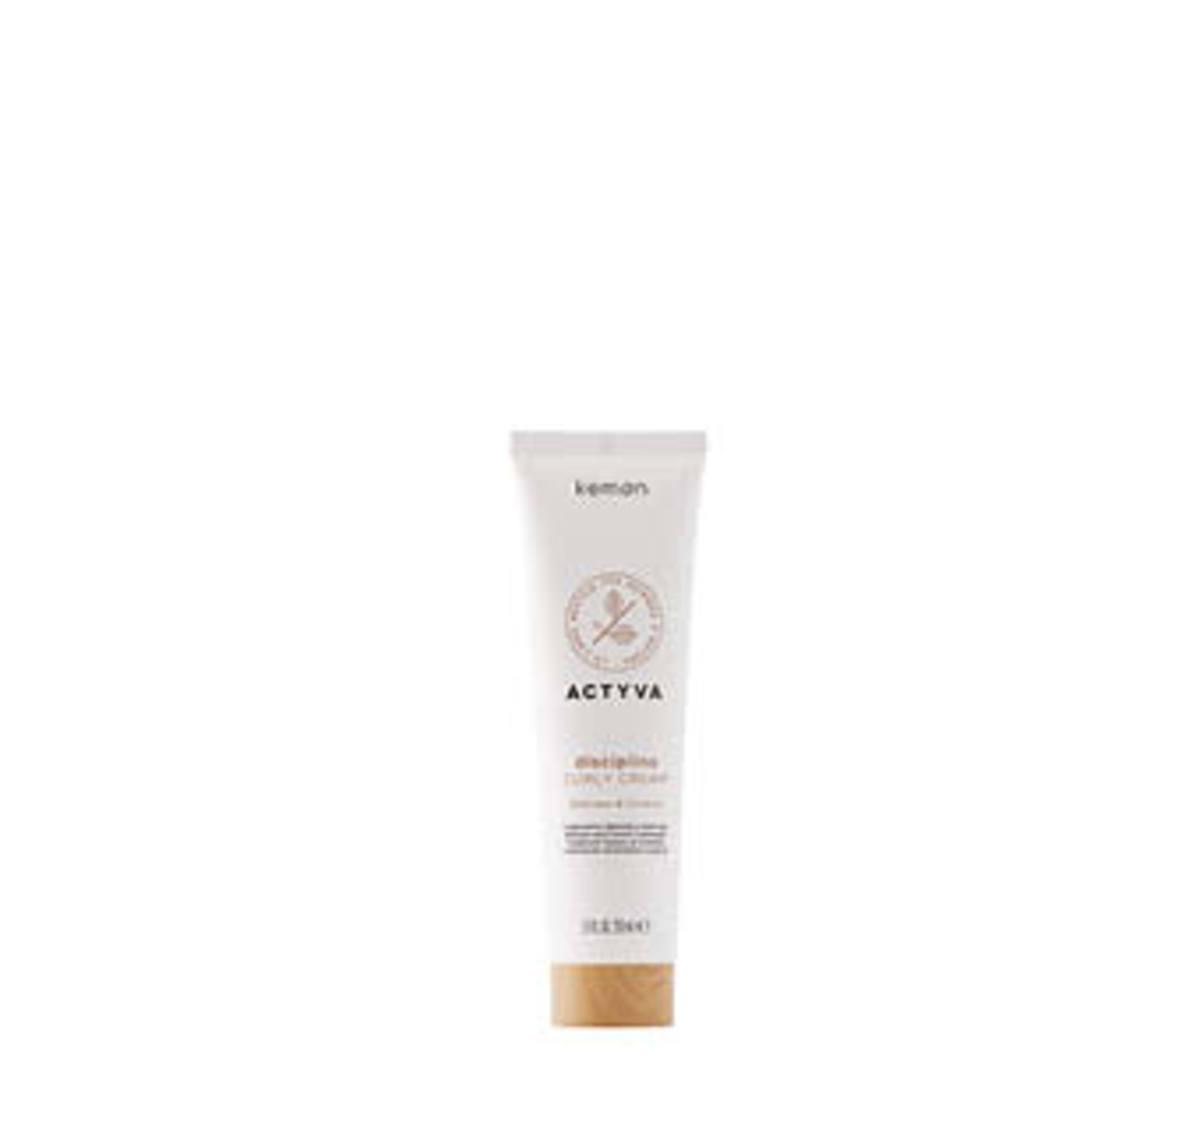 Actyva Disciplina Curly Cream 150 ML antiencrespamiento cabello rizado